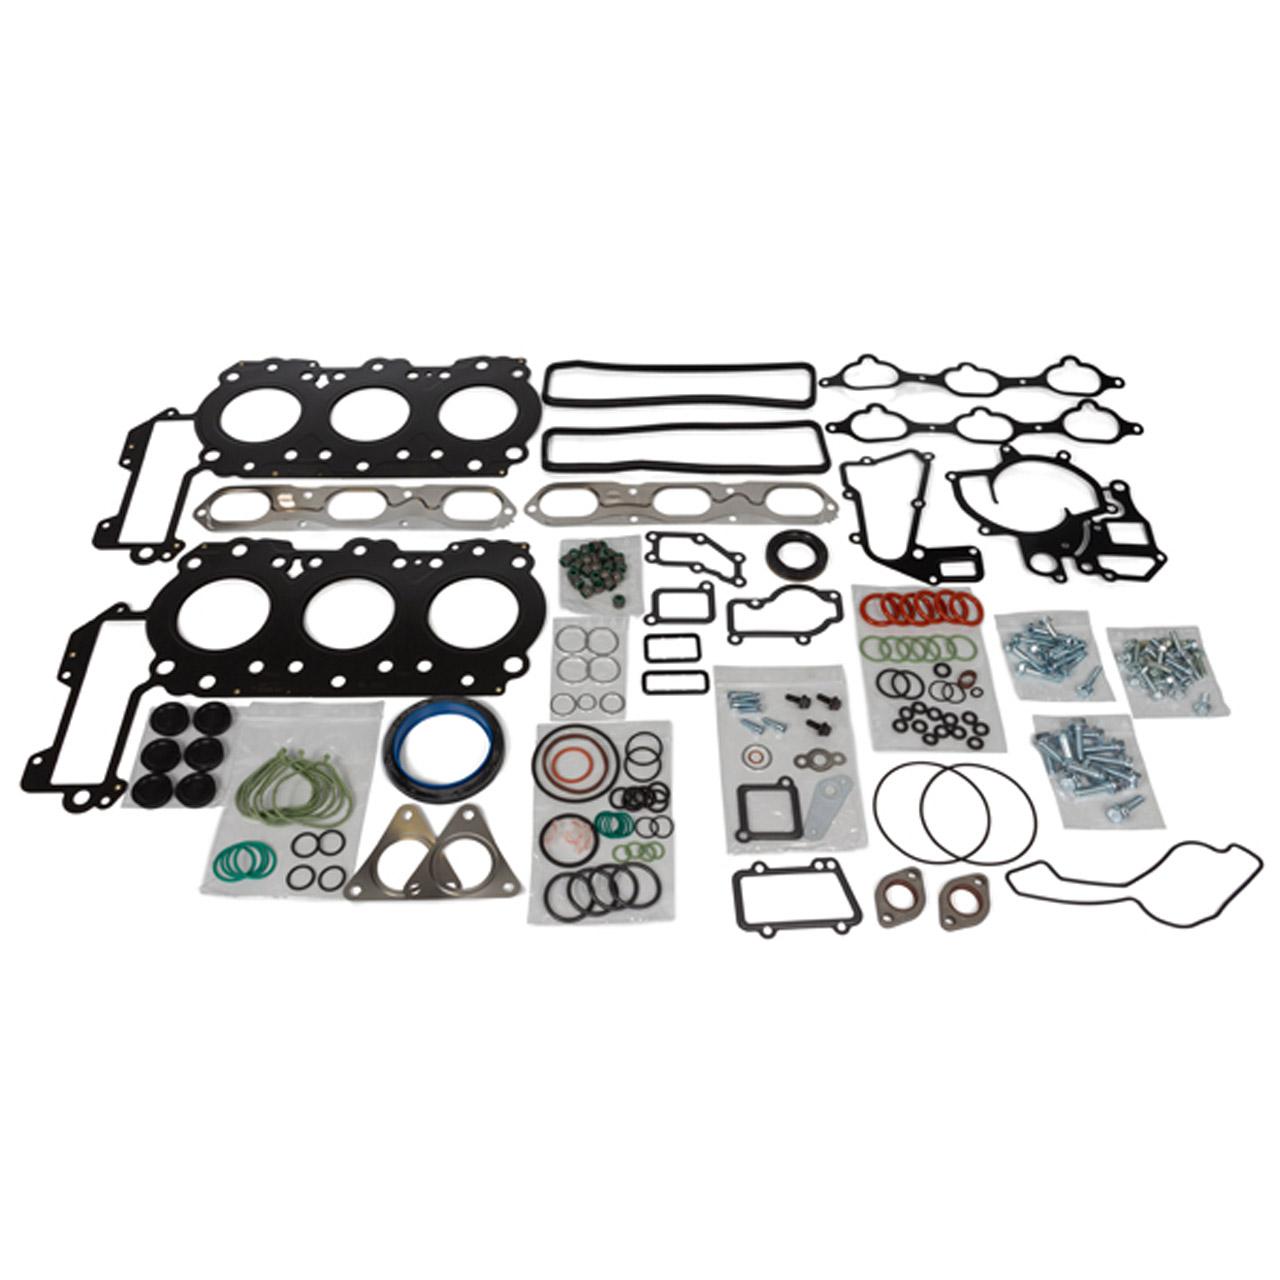 Motordichtungssatz PORSCHE Boxster 986 S 3.2 252 PS M96.21 1999-2002